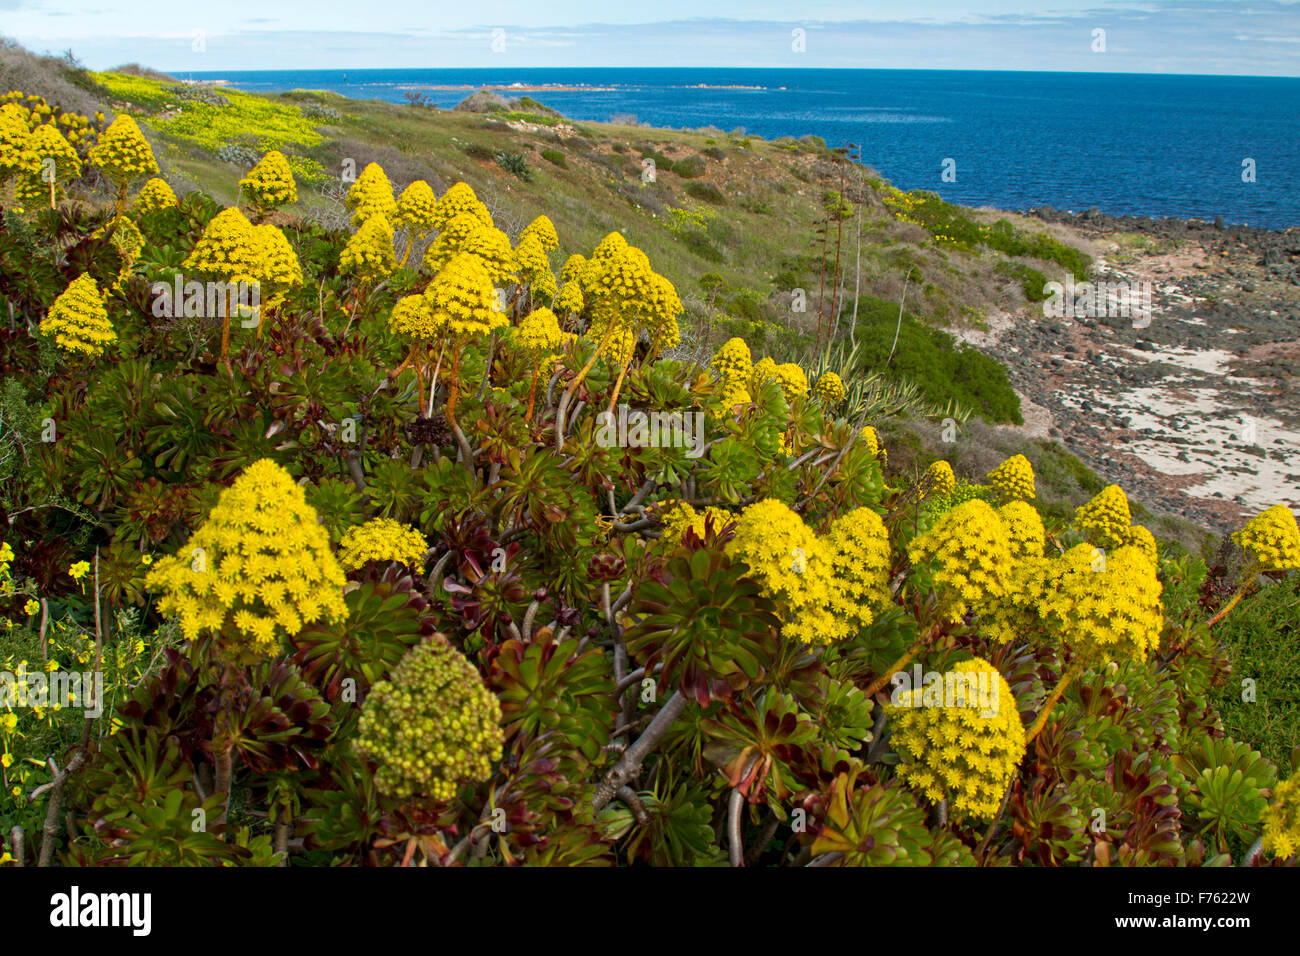 Succulent Aeonium arboreum, houseleek with mass of yellow flowers, an invasive weed species growing on coastal dunes - Stock Image